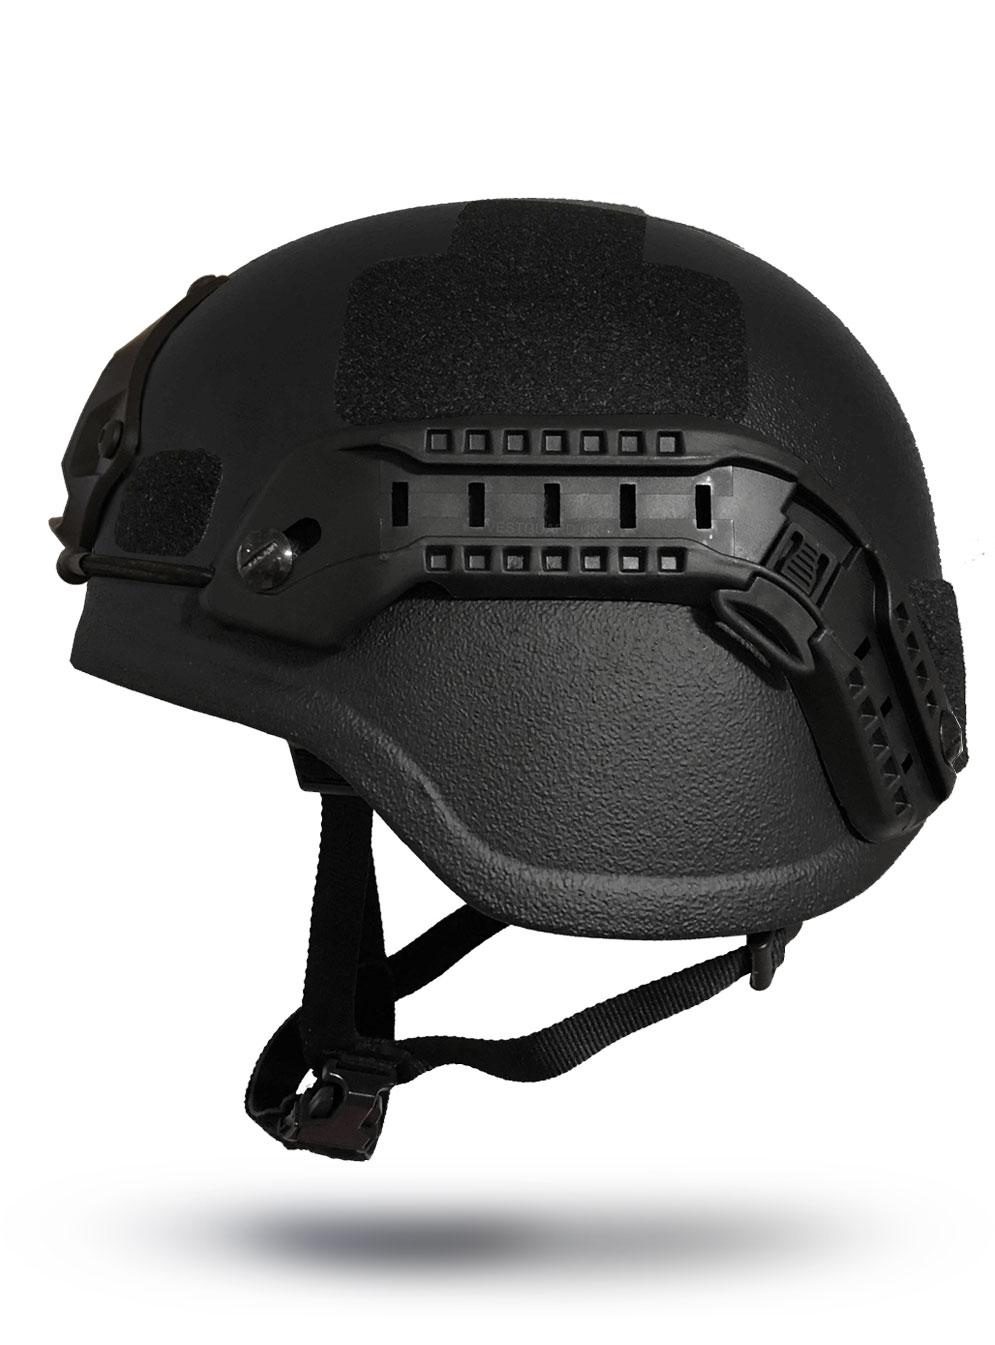 Vestguard Mich Ballistic Helmet Nij Level Iiia 9mm 44